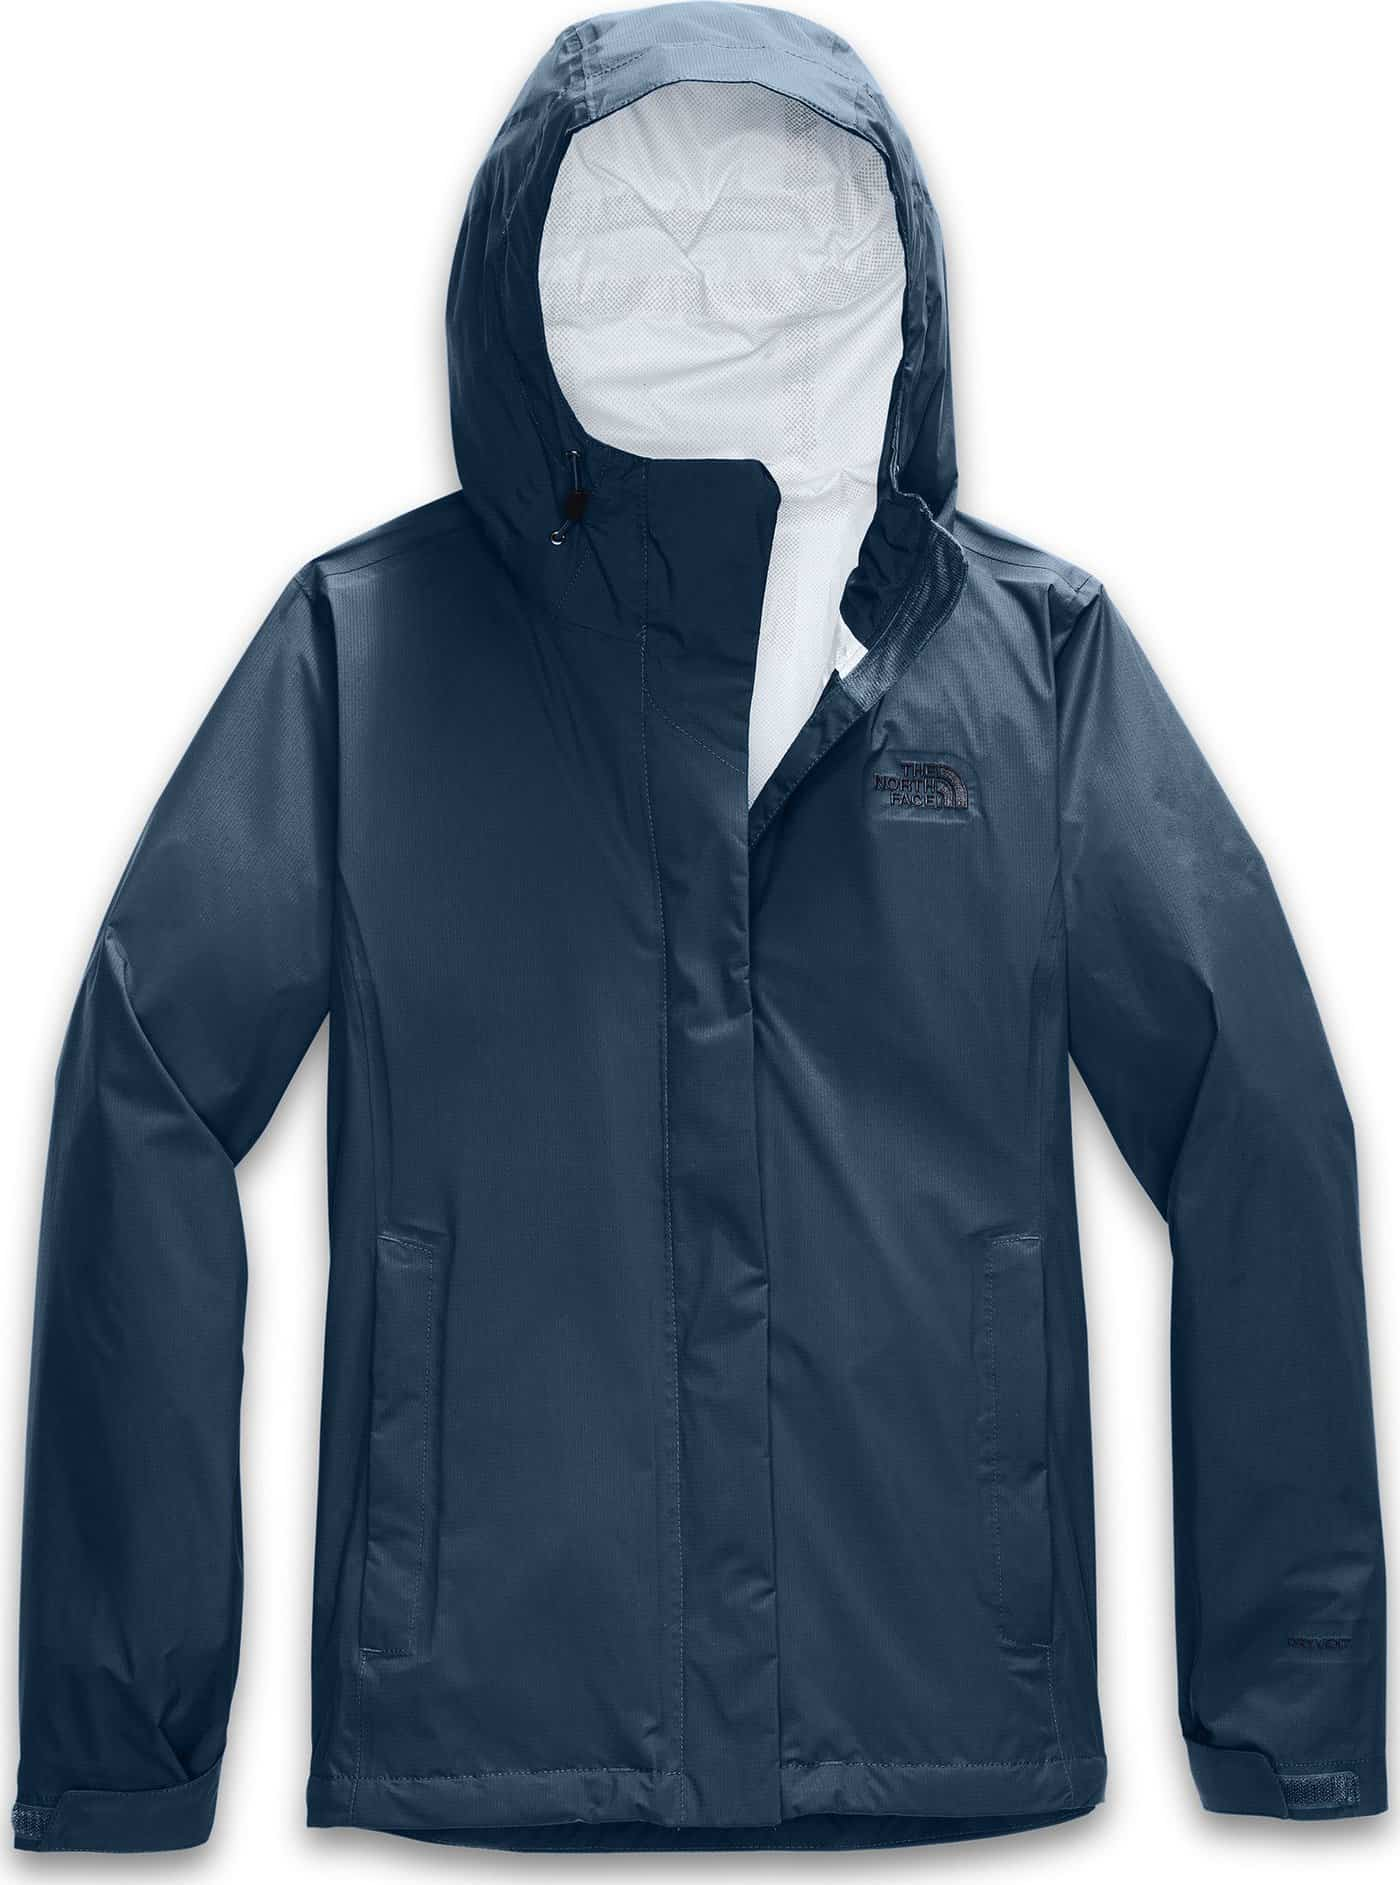 The Norh Face - Venture 2 Jacket - Women's